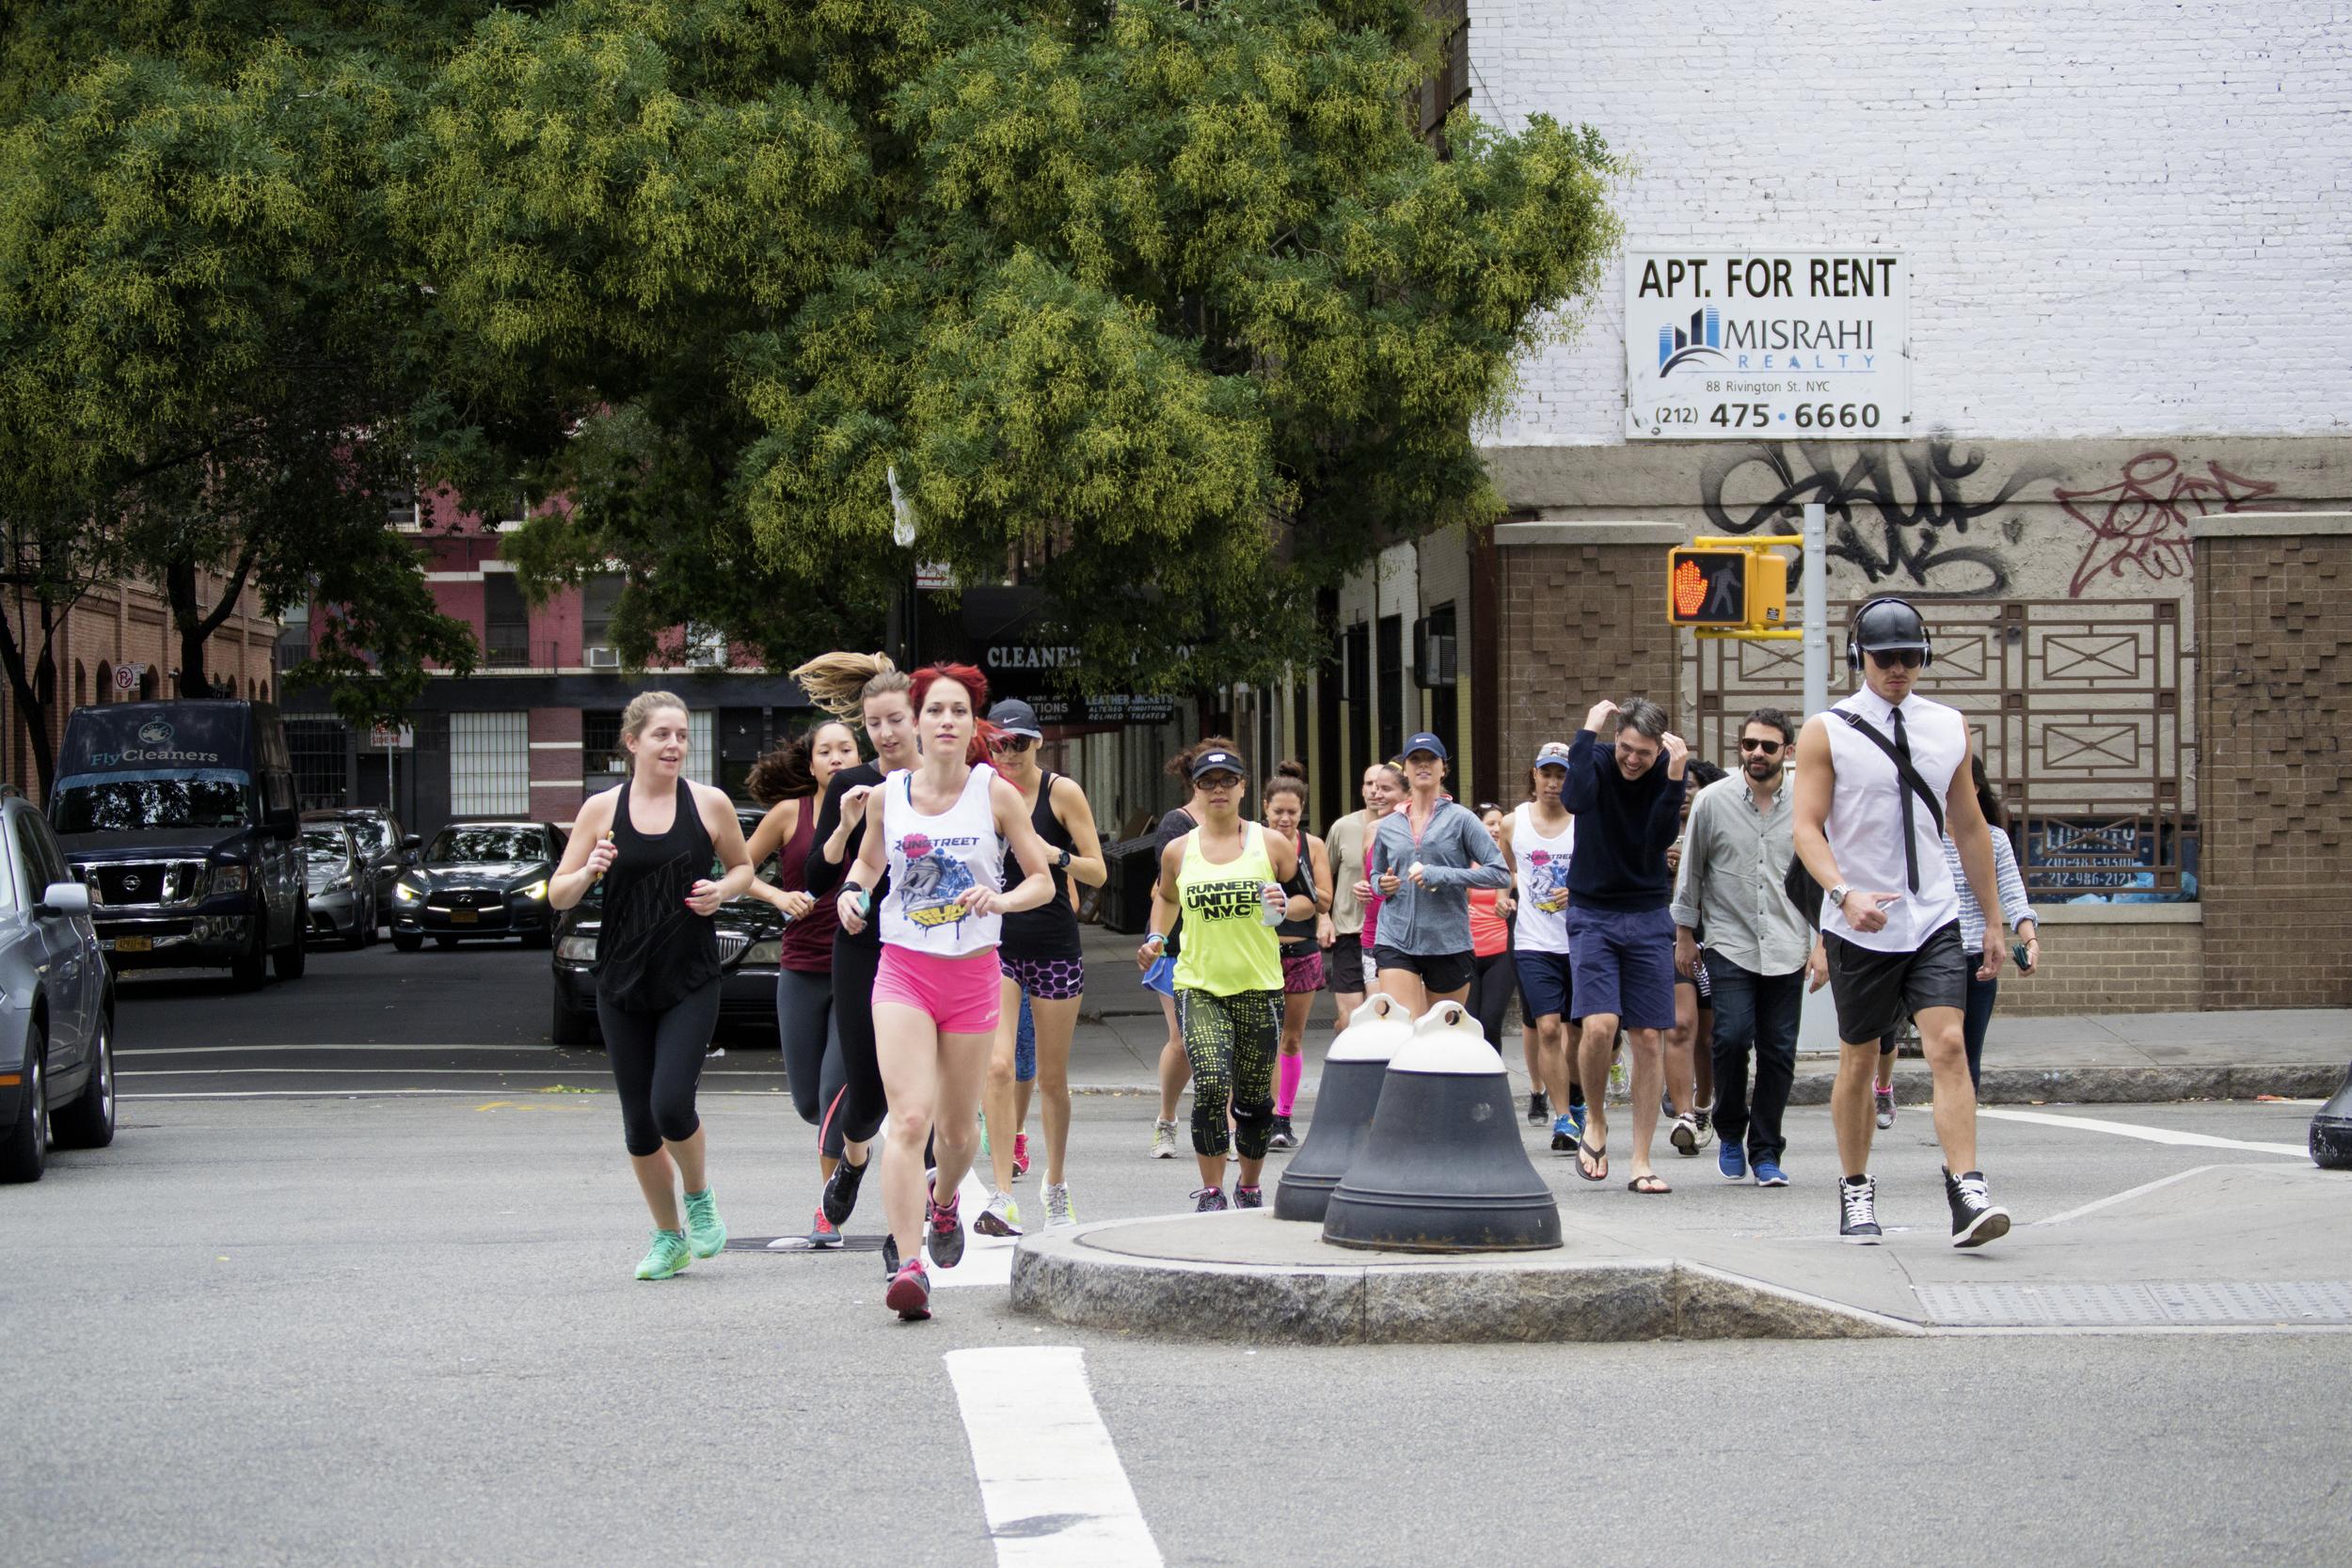 Runstreet-nyc-runners-graffiti-run